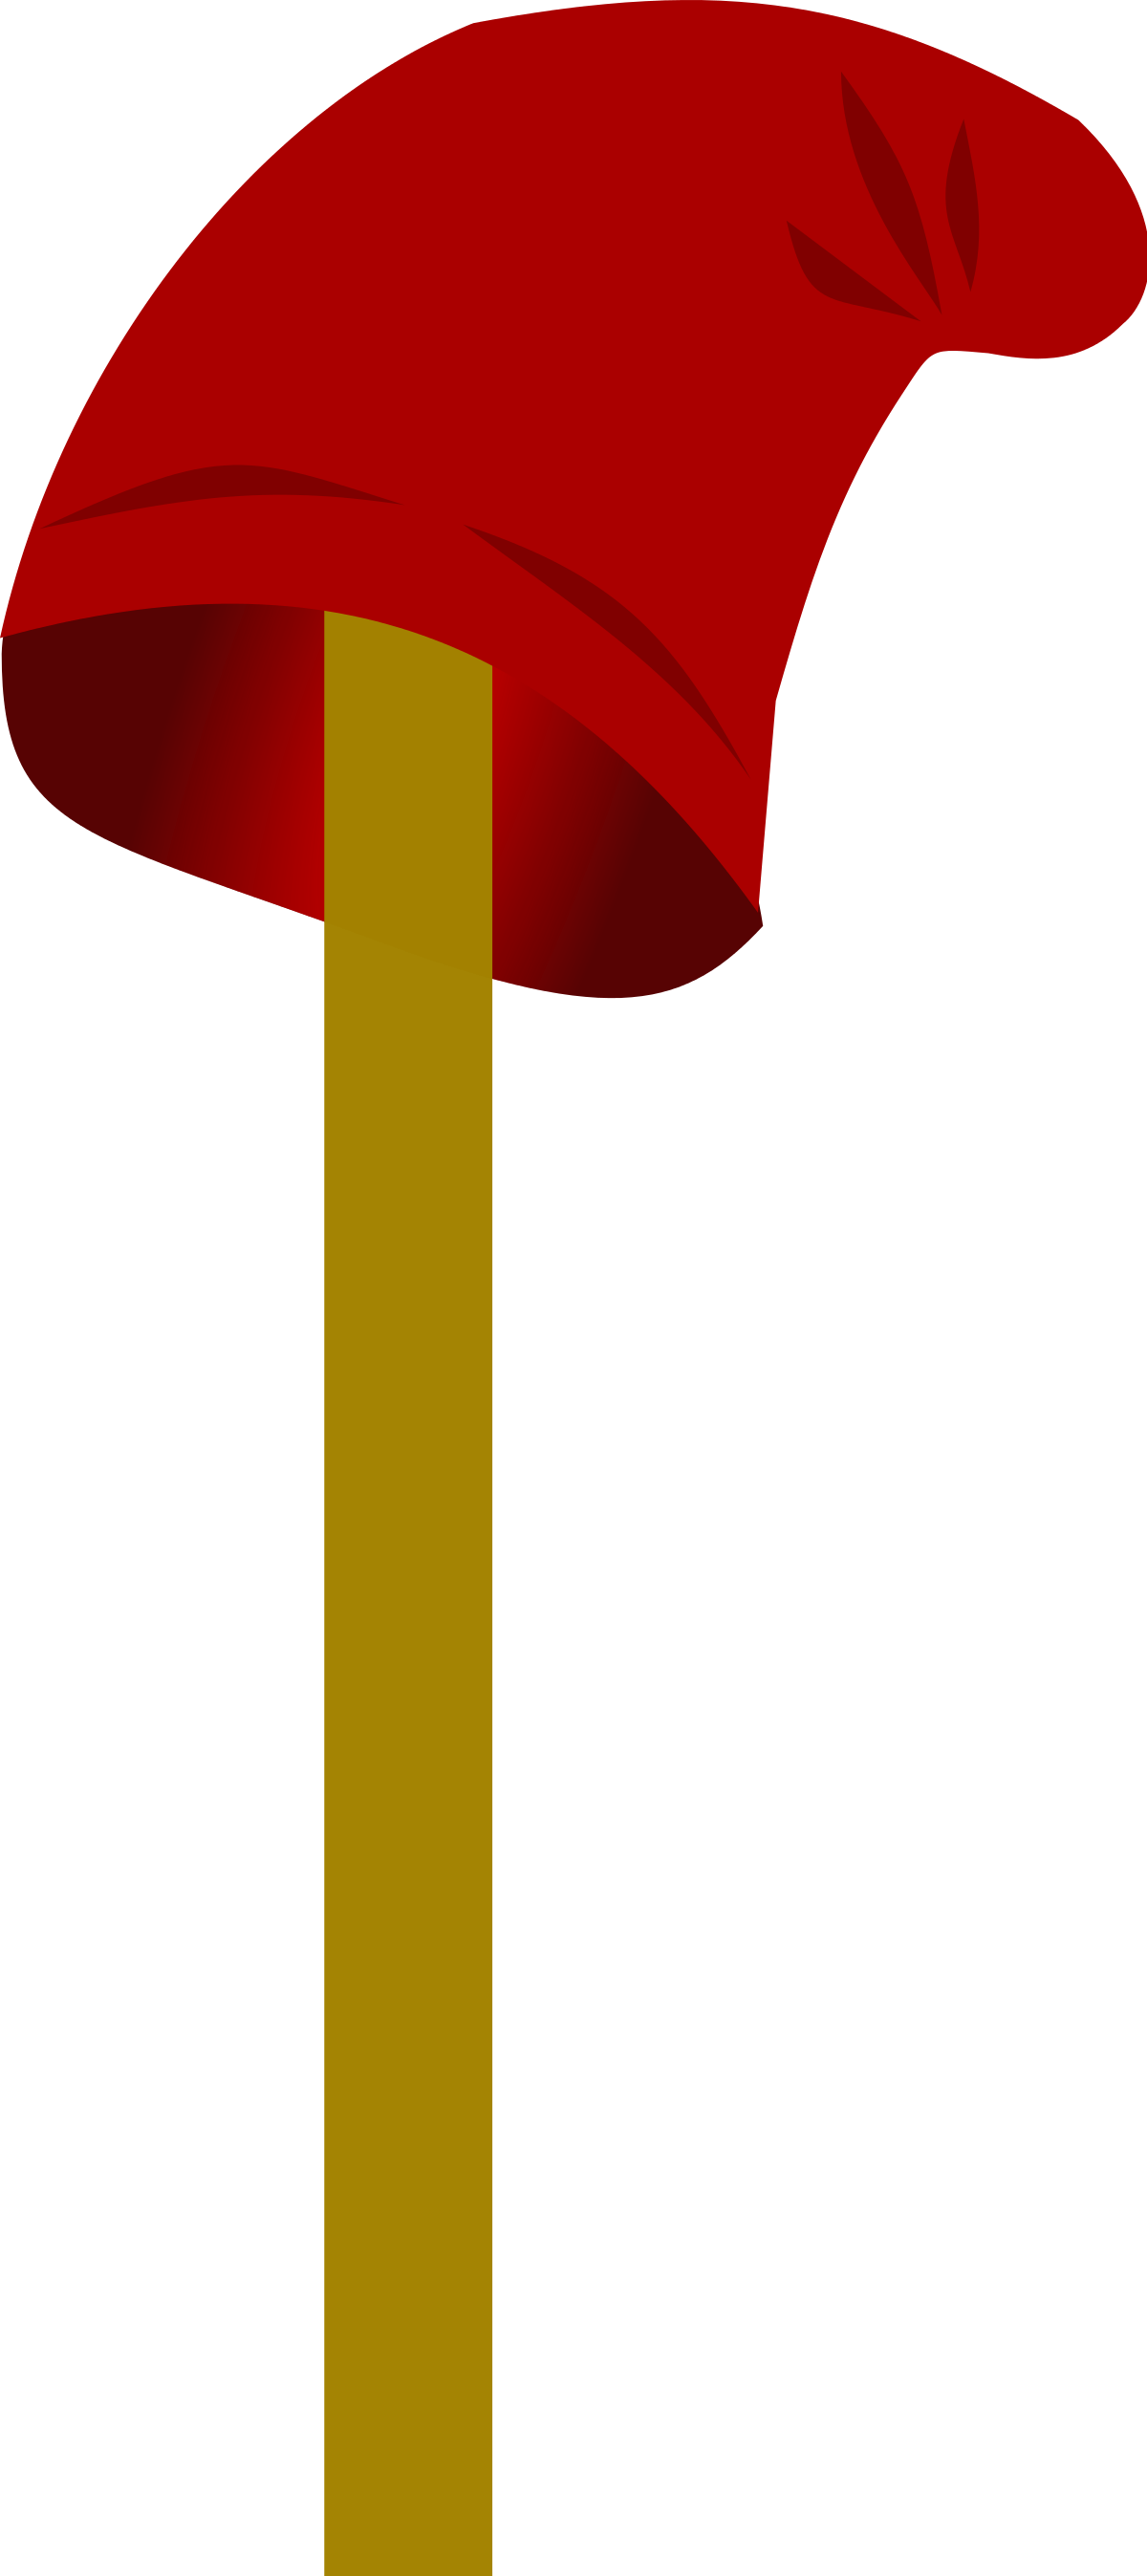 Hats clipart revolutionary war. Liberty pole wikipedia